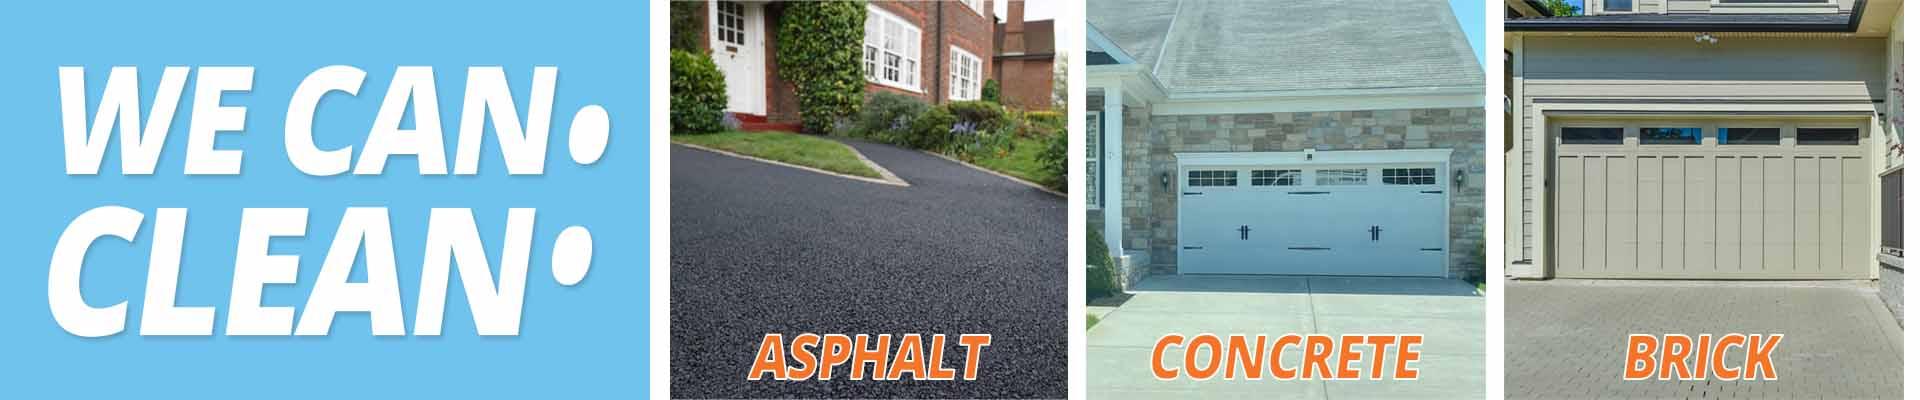 we can clean asphalt concrete and brick